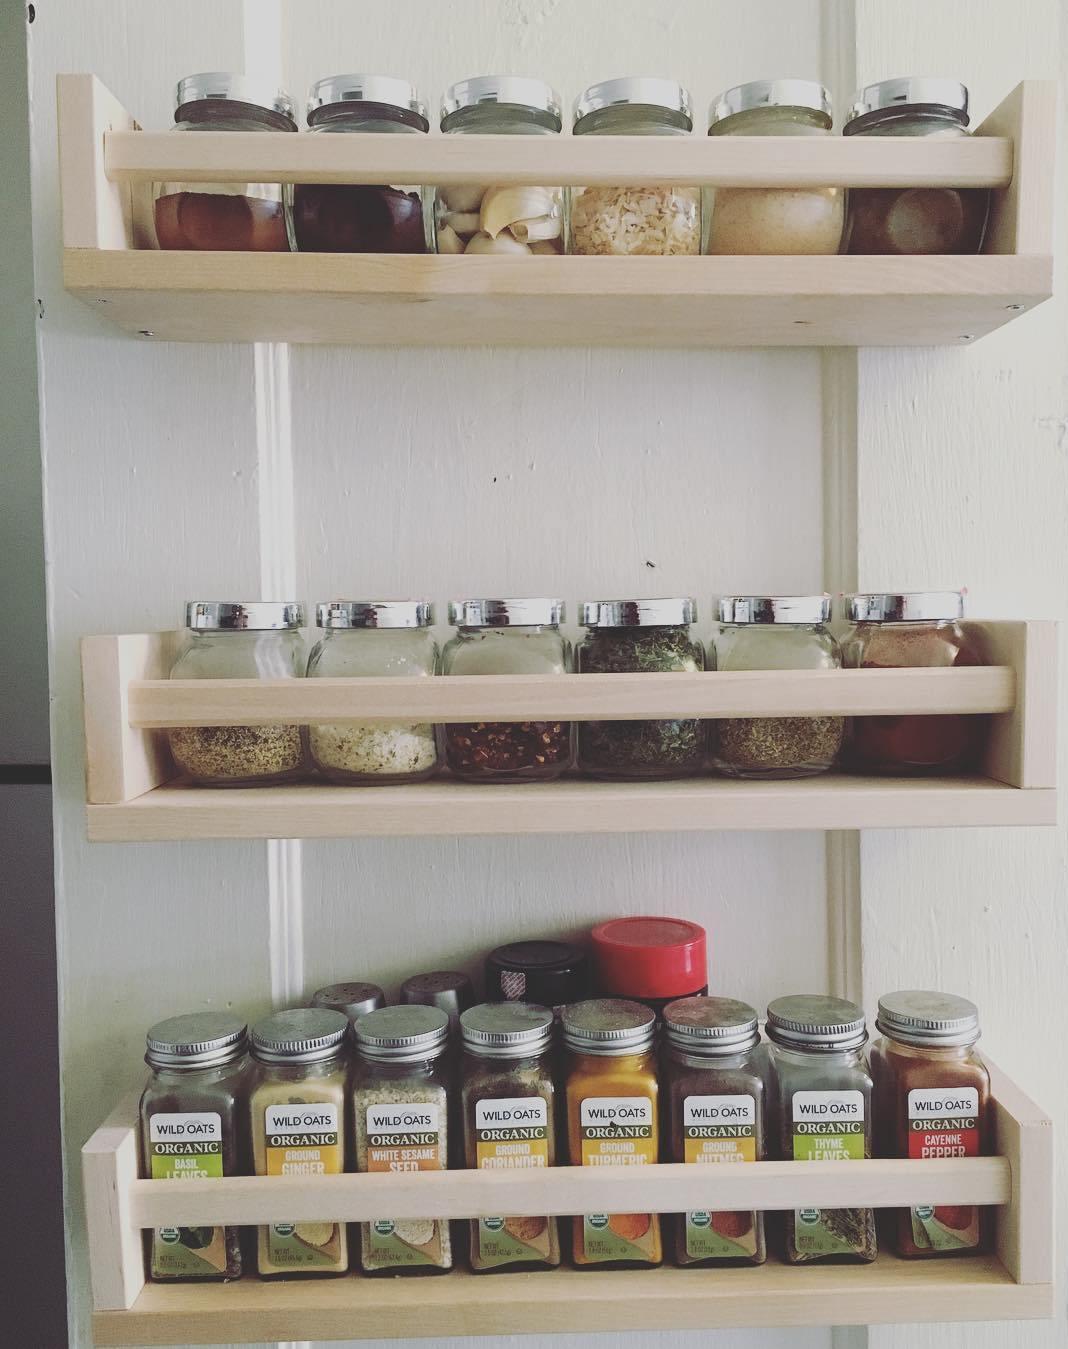 revolving spice racks for kitchen led light rack ideas the and pantry buungi